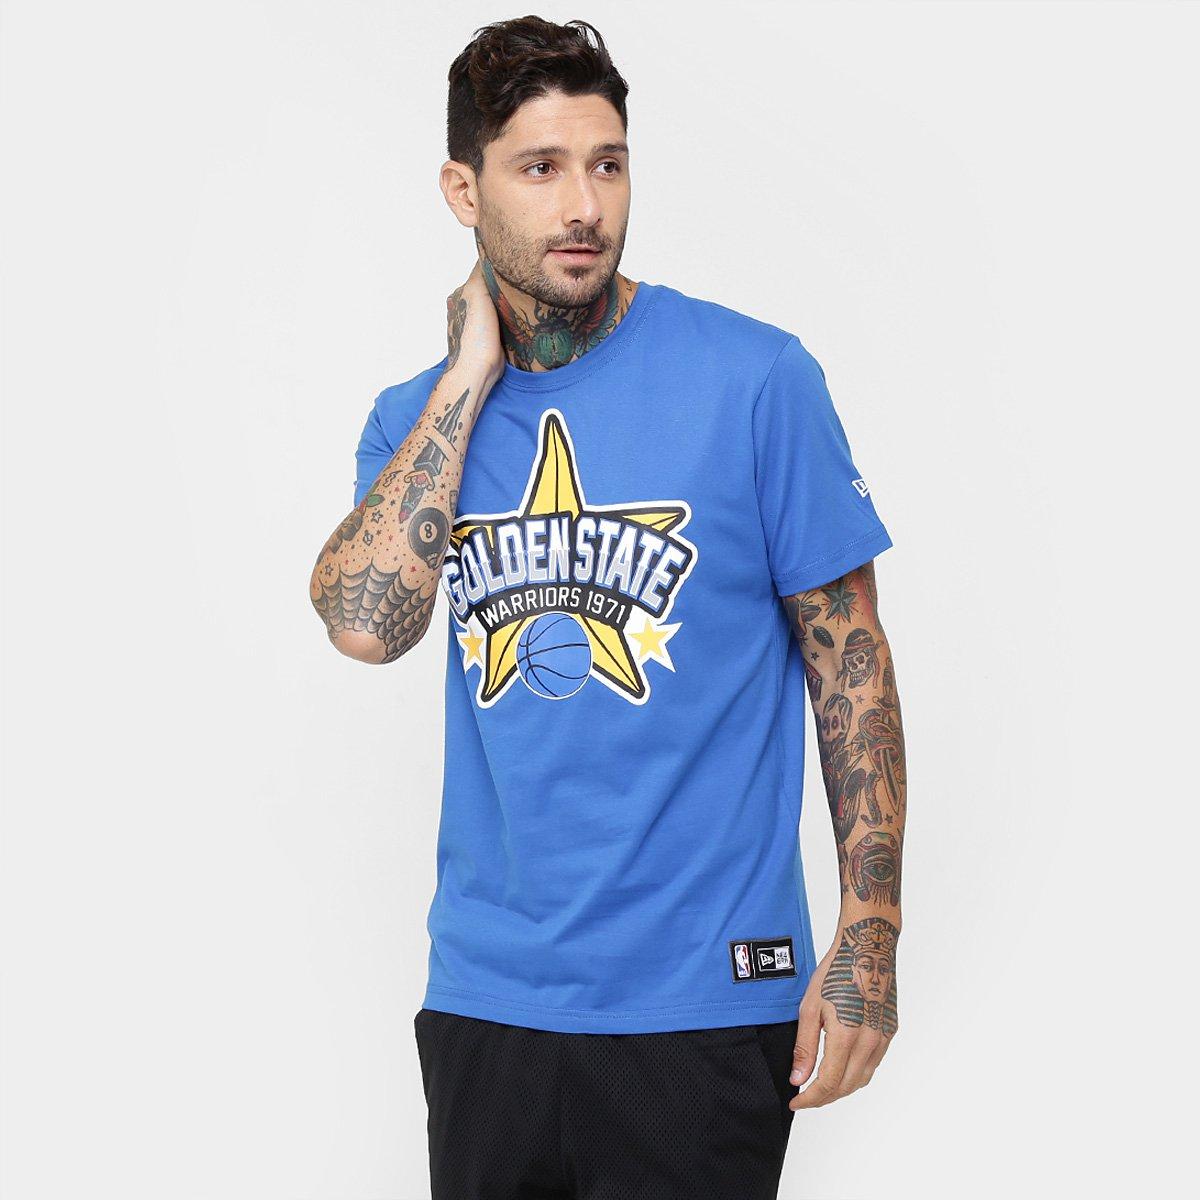 1522c5450 Camiseta New Era NBA Star Golden State Warriors - Compre Agora ...